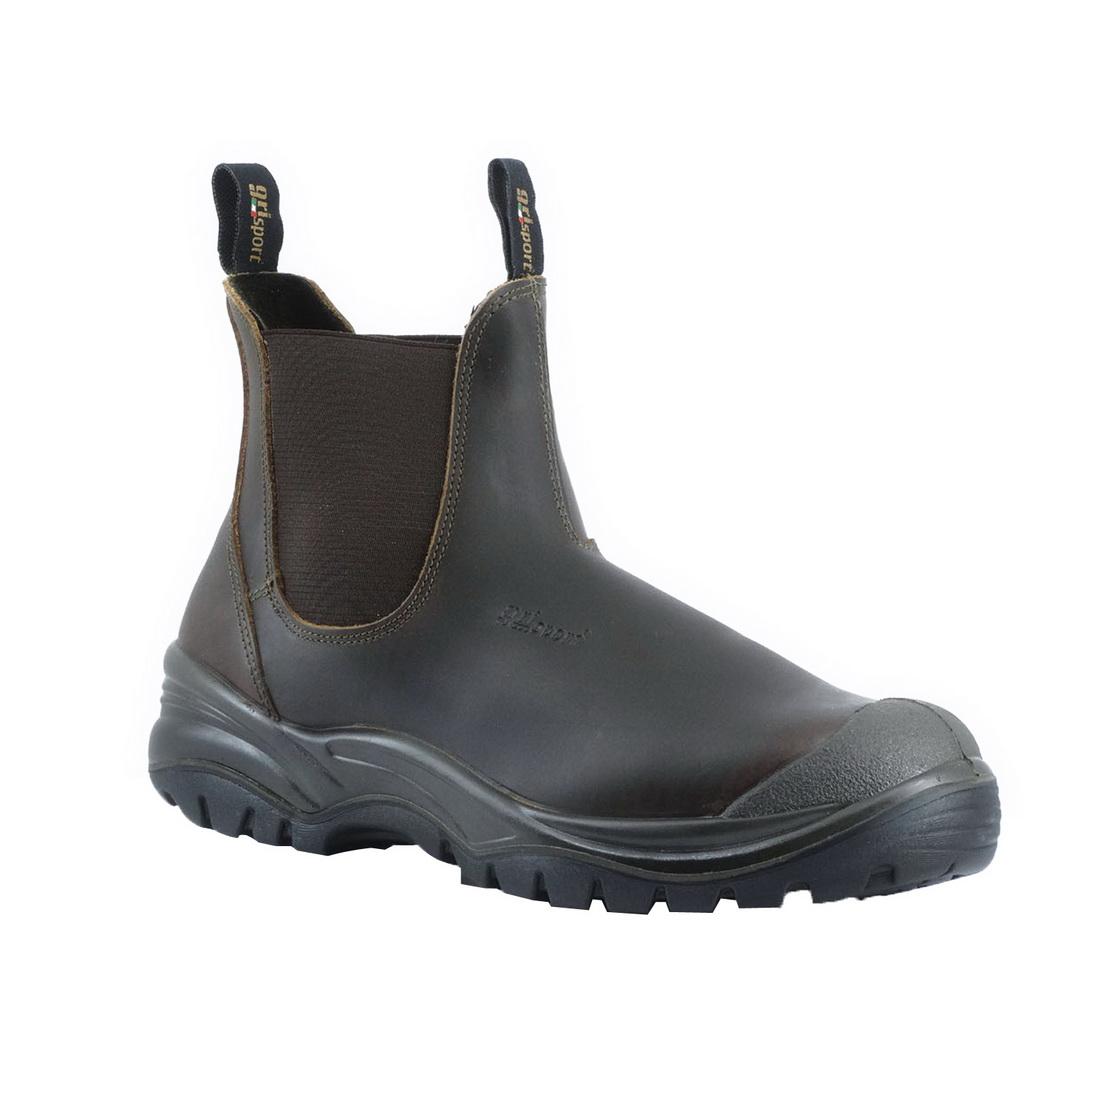 Genoa Safety Slip On Safety Boot Size 12 Brown Dakar Leather